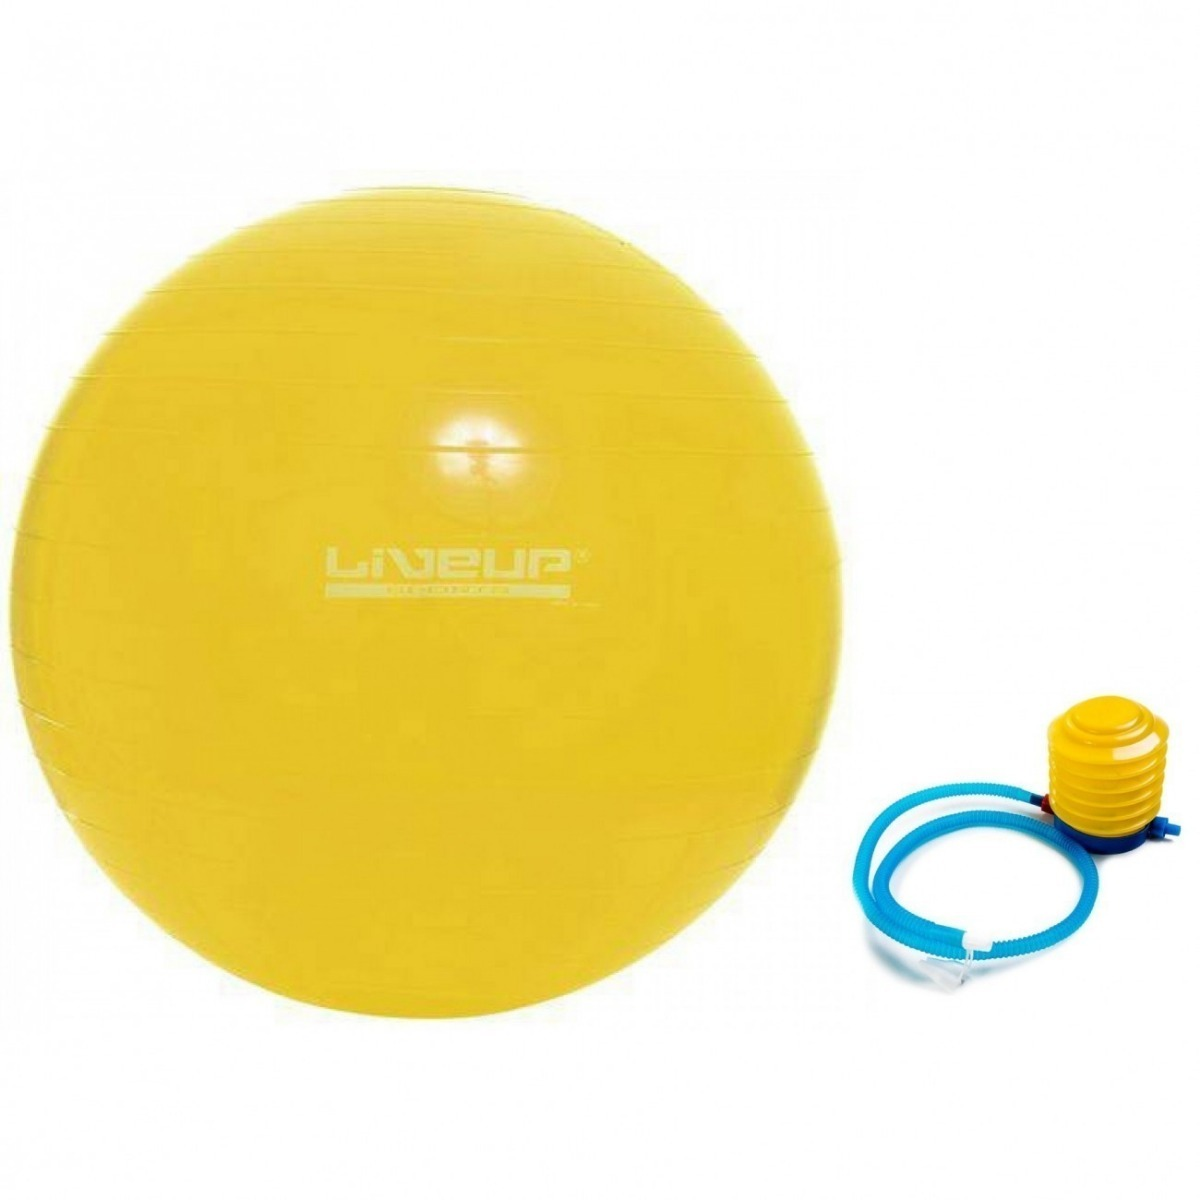 0eb9ecdd56f2c bola suiça 75 cm c  bomba liveup - yoga pilates fitness. Carregando zoom.